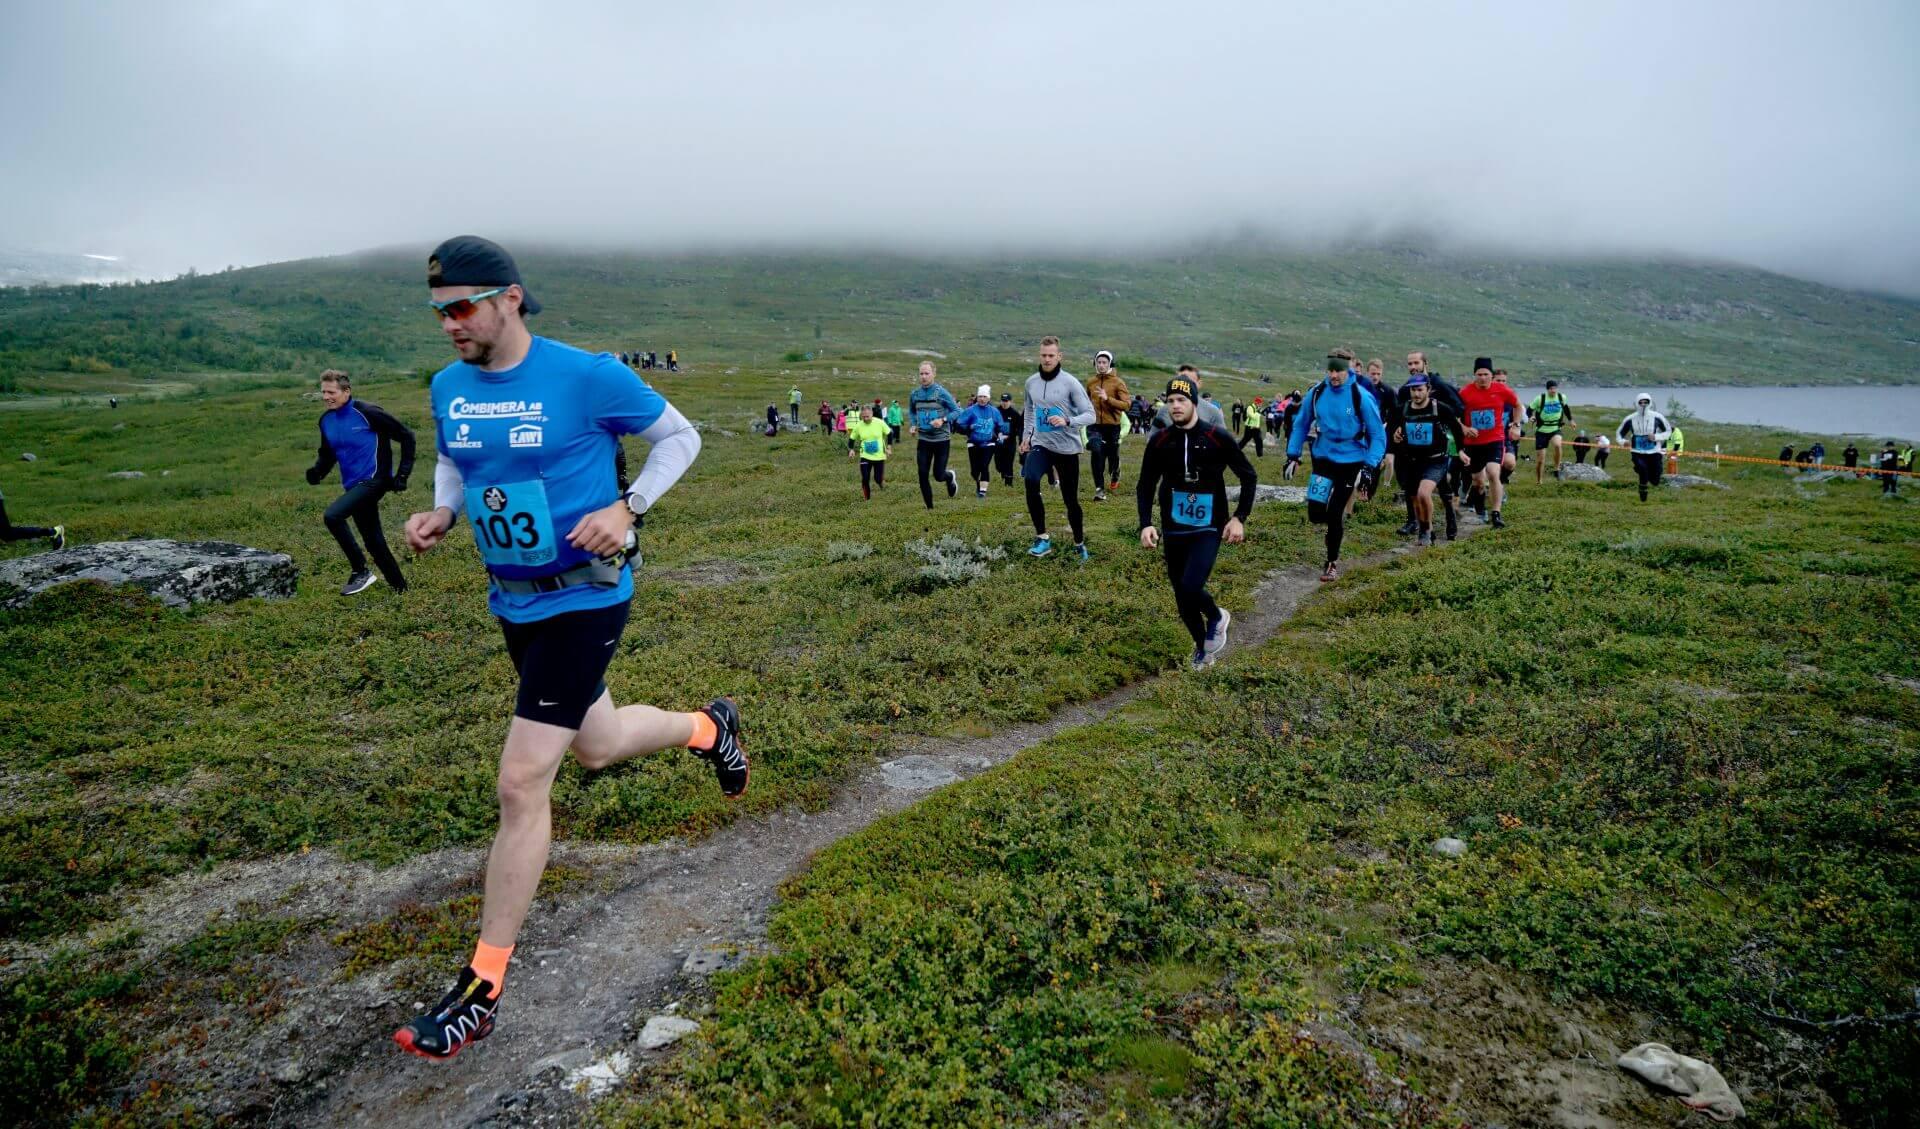 Arctic Circle Race 2019 Polcirkelloppet Guijaure start 2